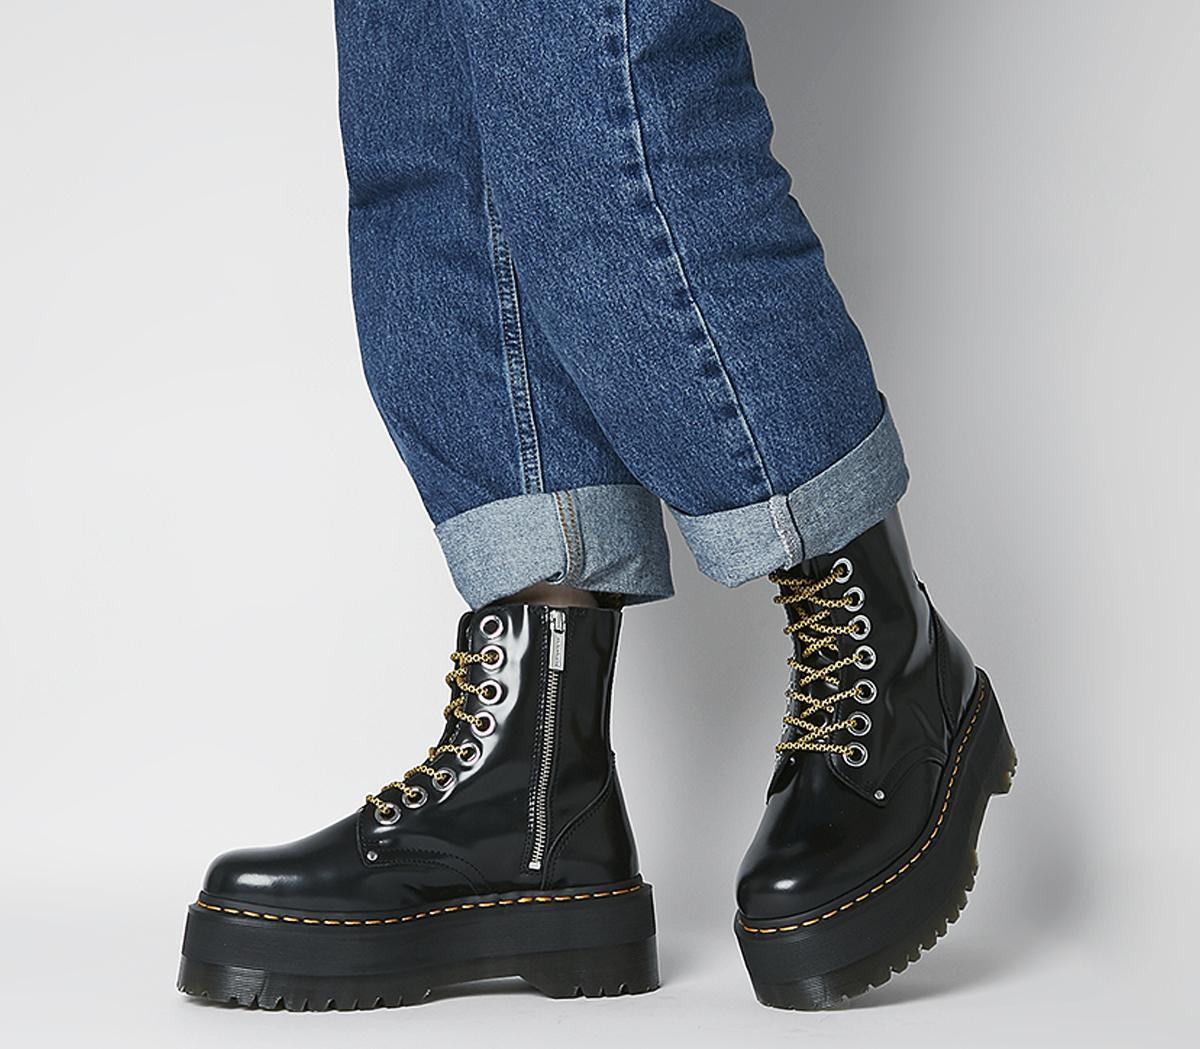 Jadon Max Boots